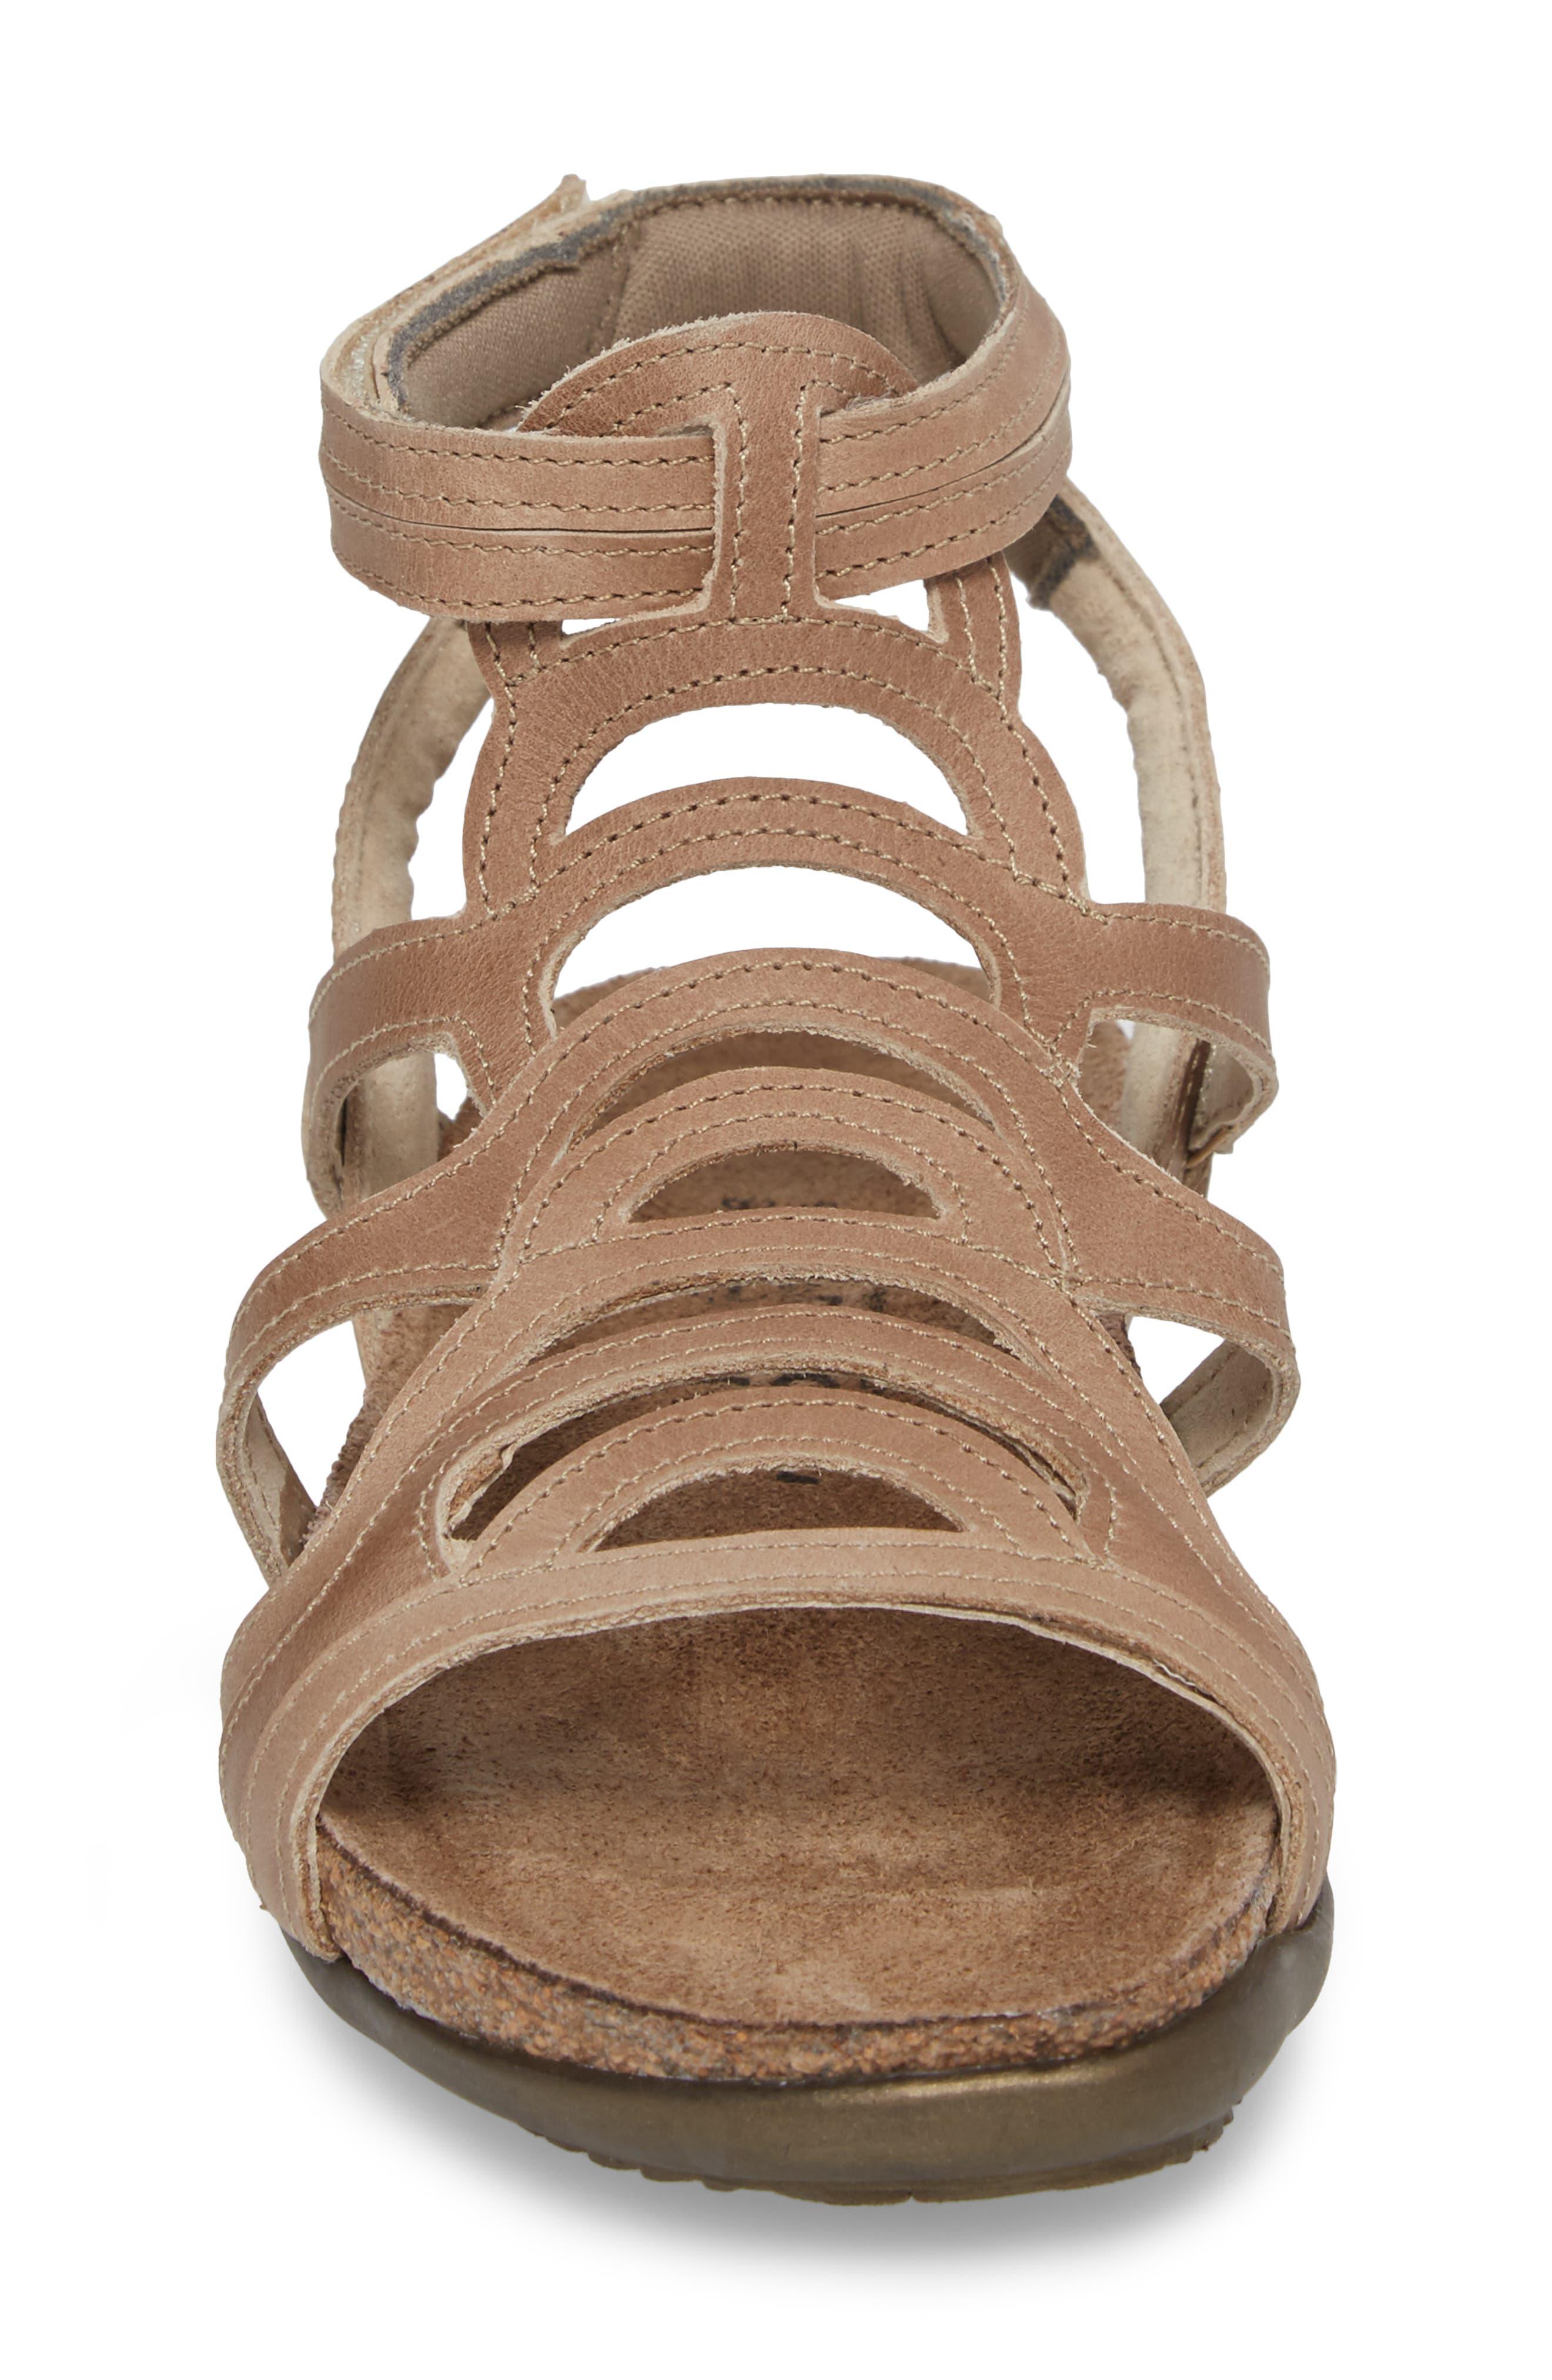 'Sara' Gladiator Sandal,                             Alternate thumbnail 4, color,                             Khaki Beige Leather